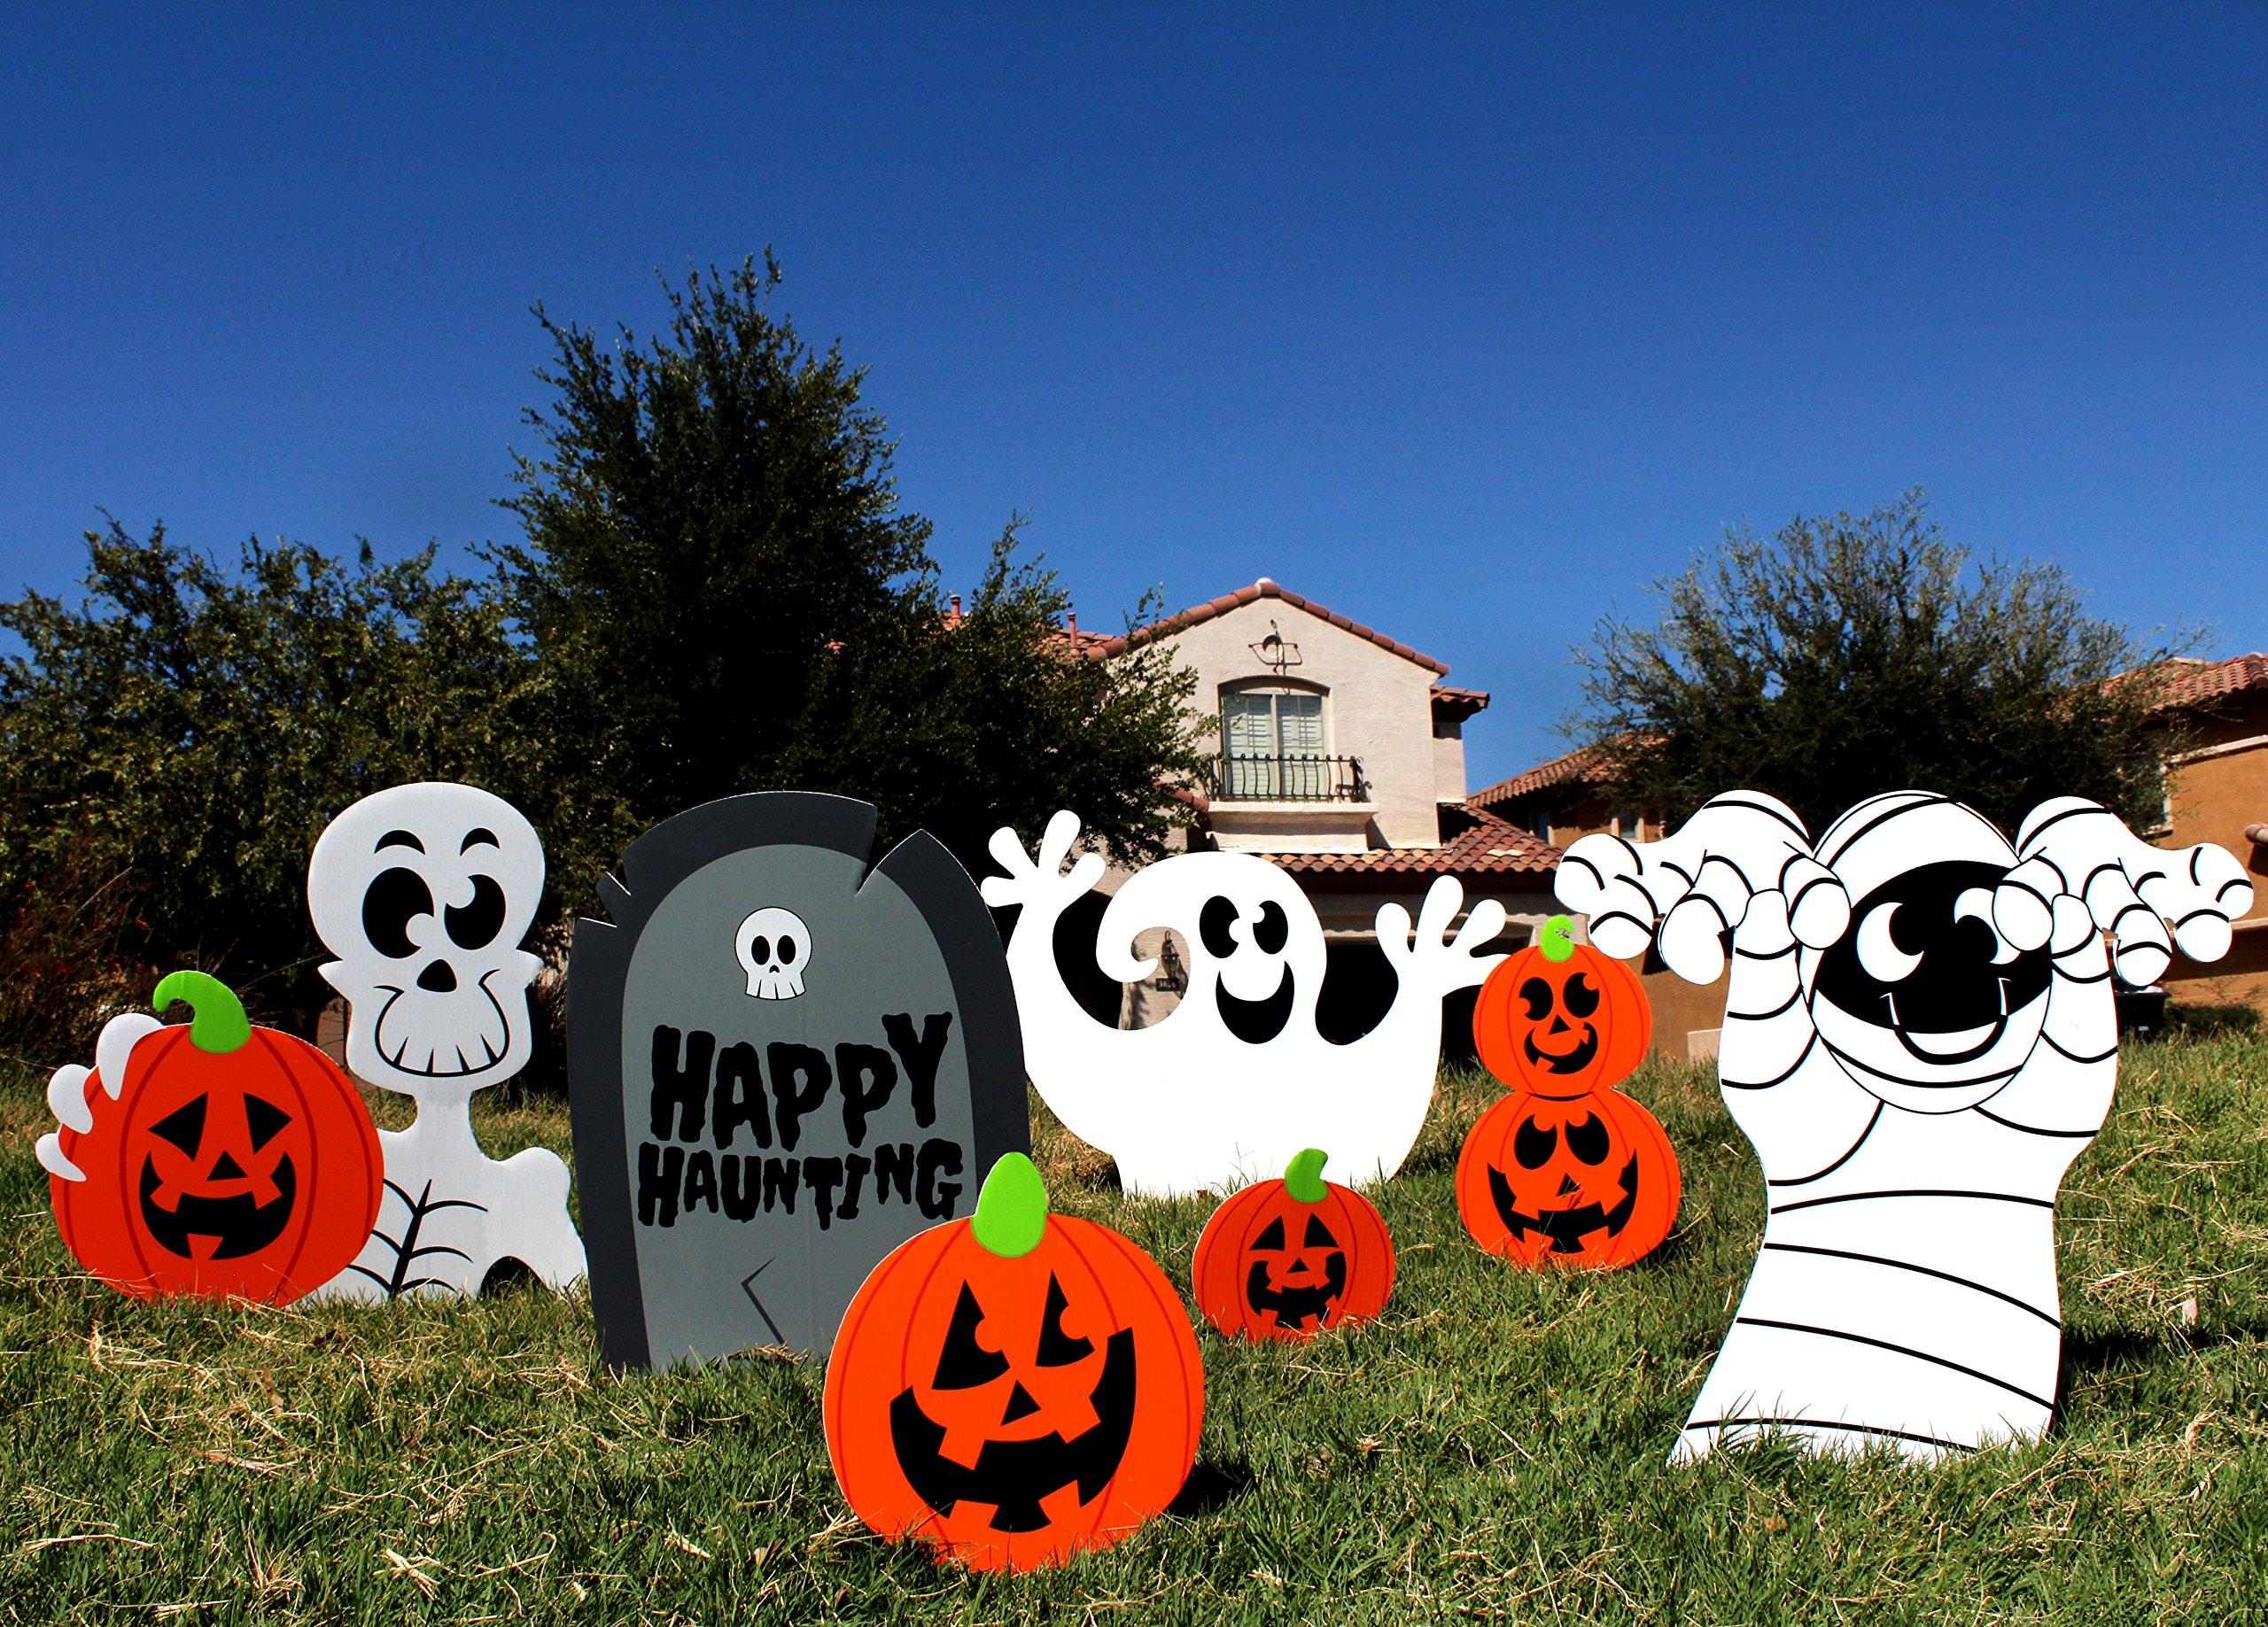 JOYIN Halloween Decorations Outdoor Skeleton Ghost Corrugate Yard Stake Signs Halloween Lawn Yard Decorations (Pack of 7)